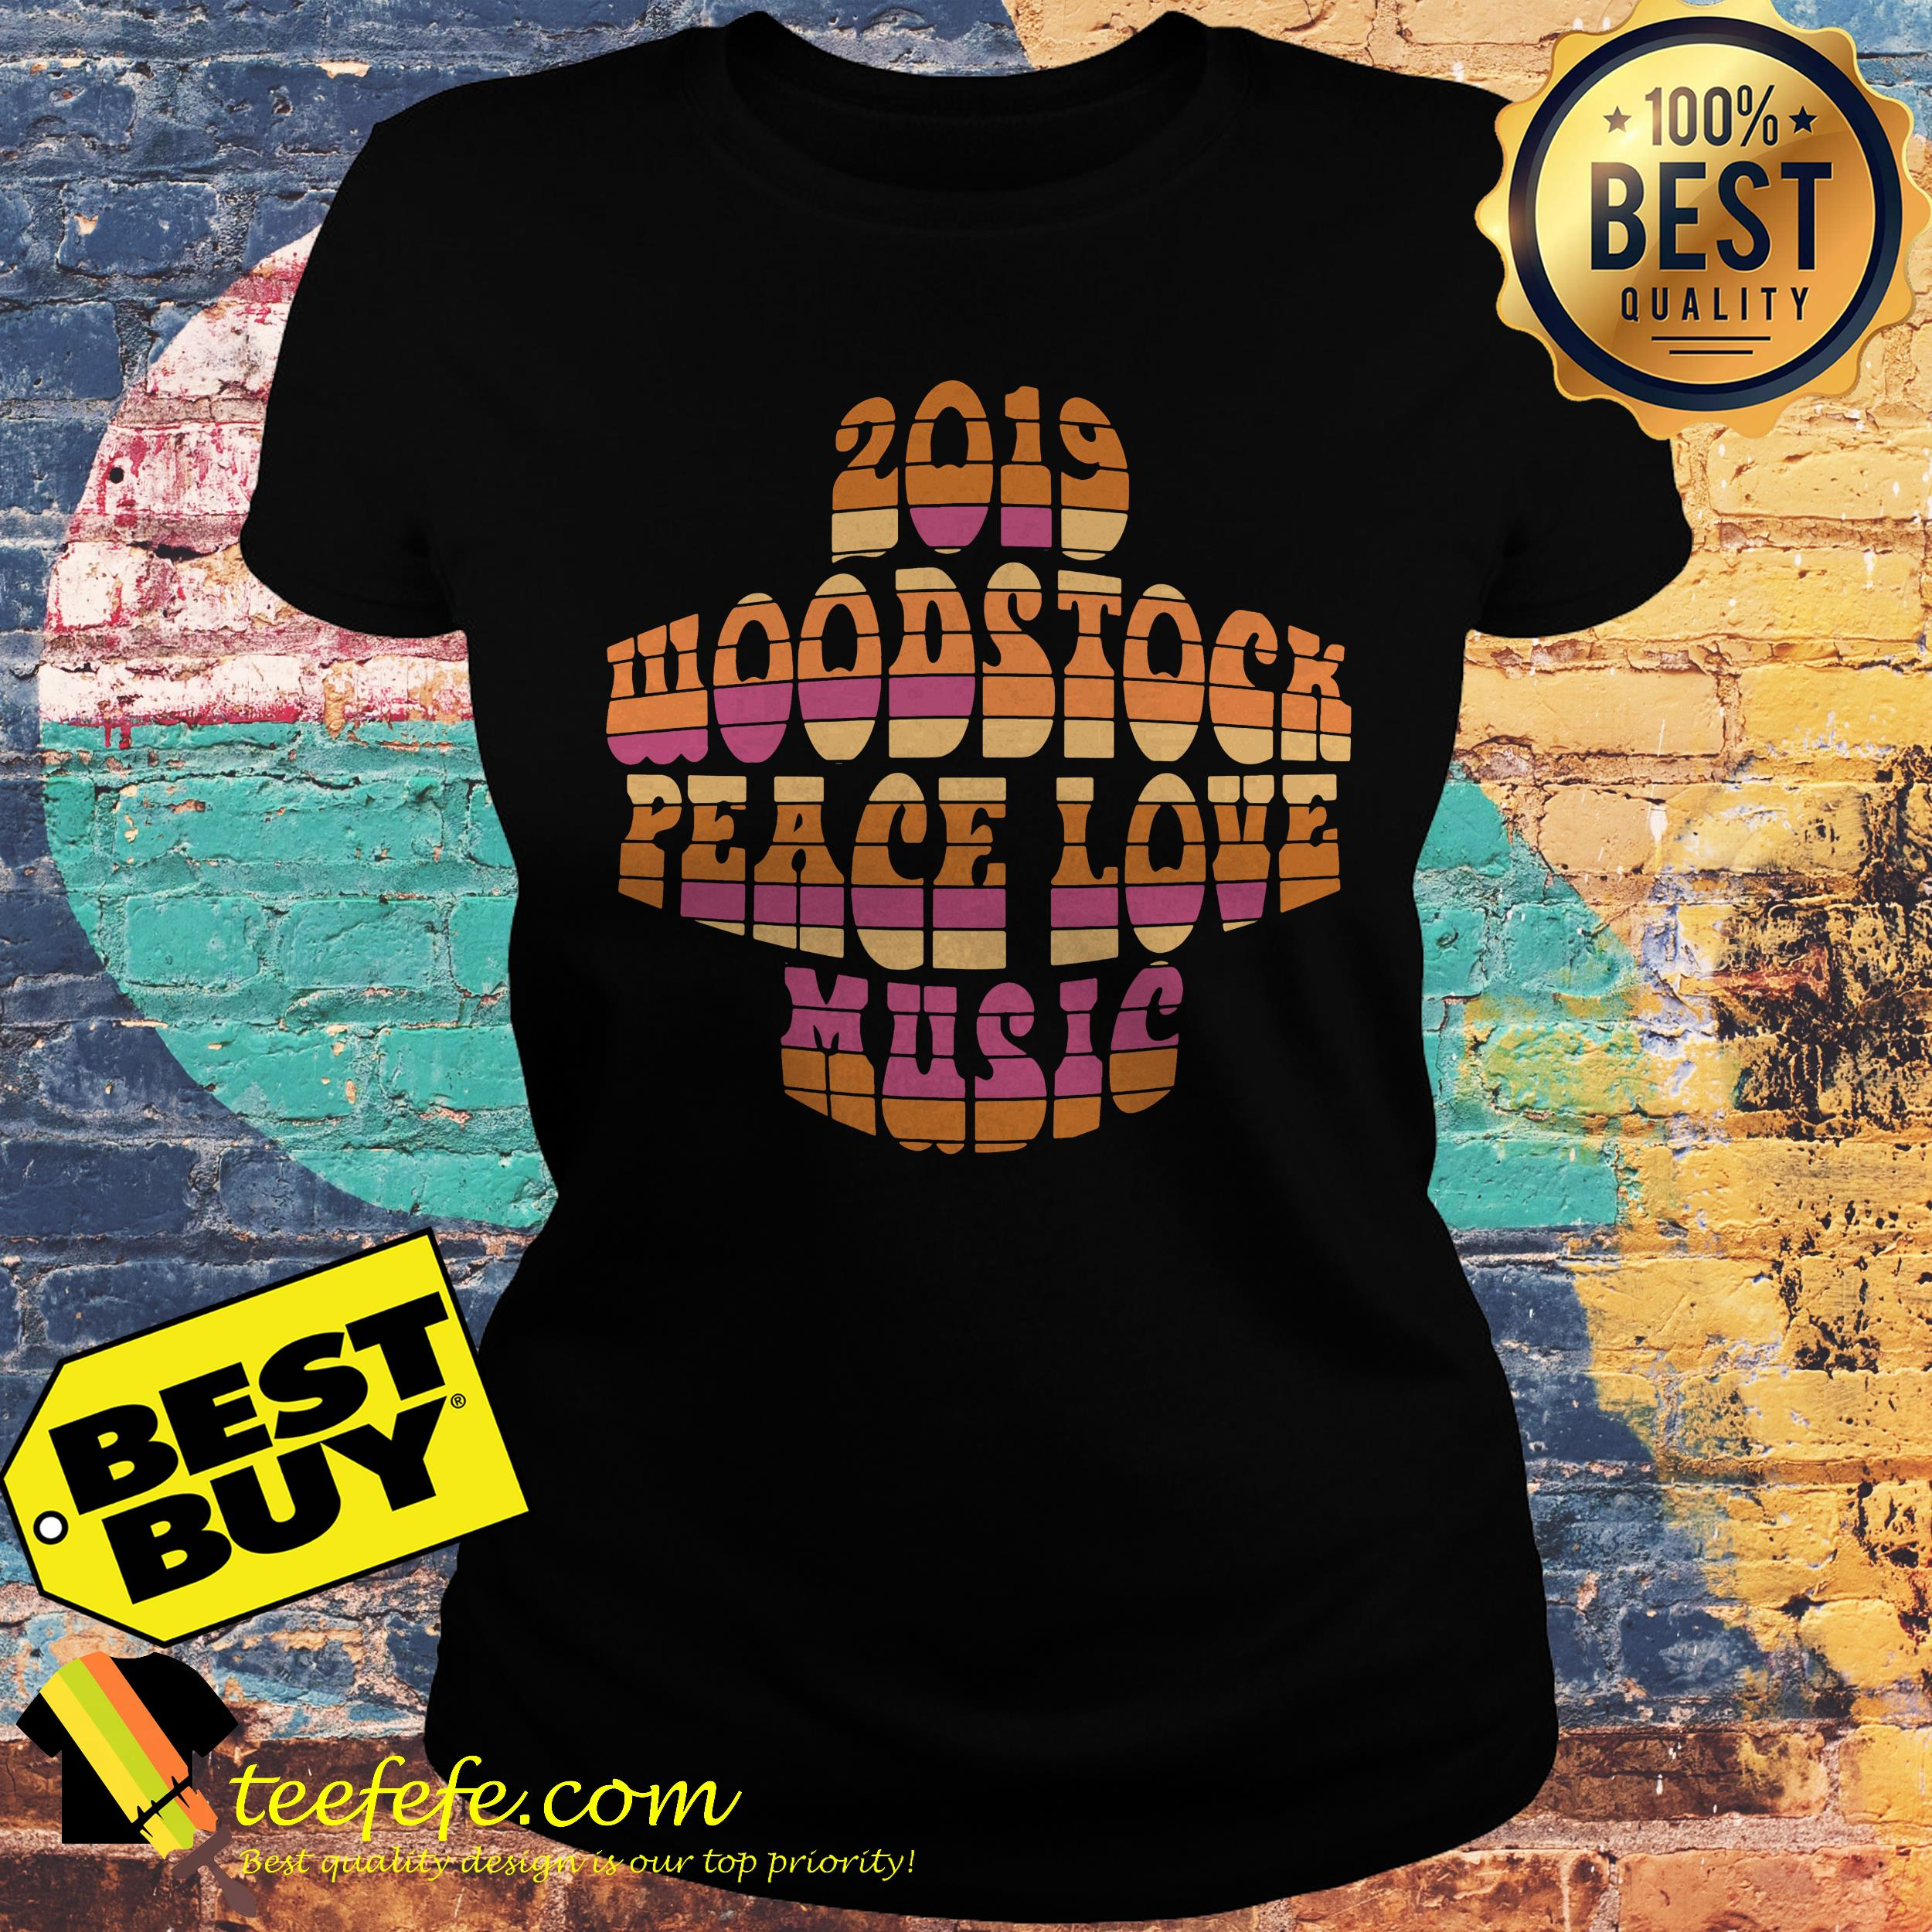 2019 Woodstock peace love music ladies tee